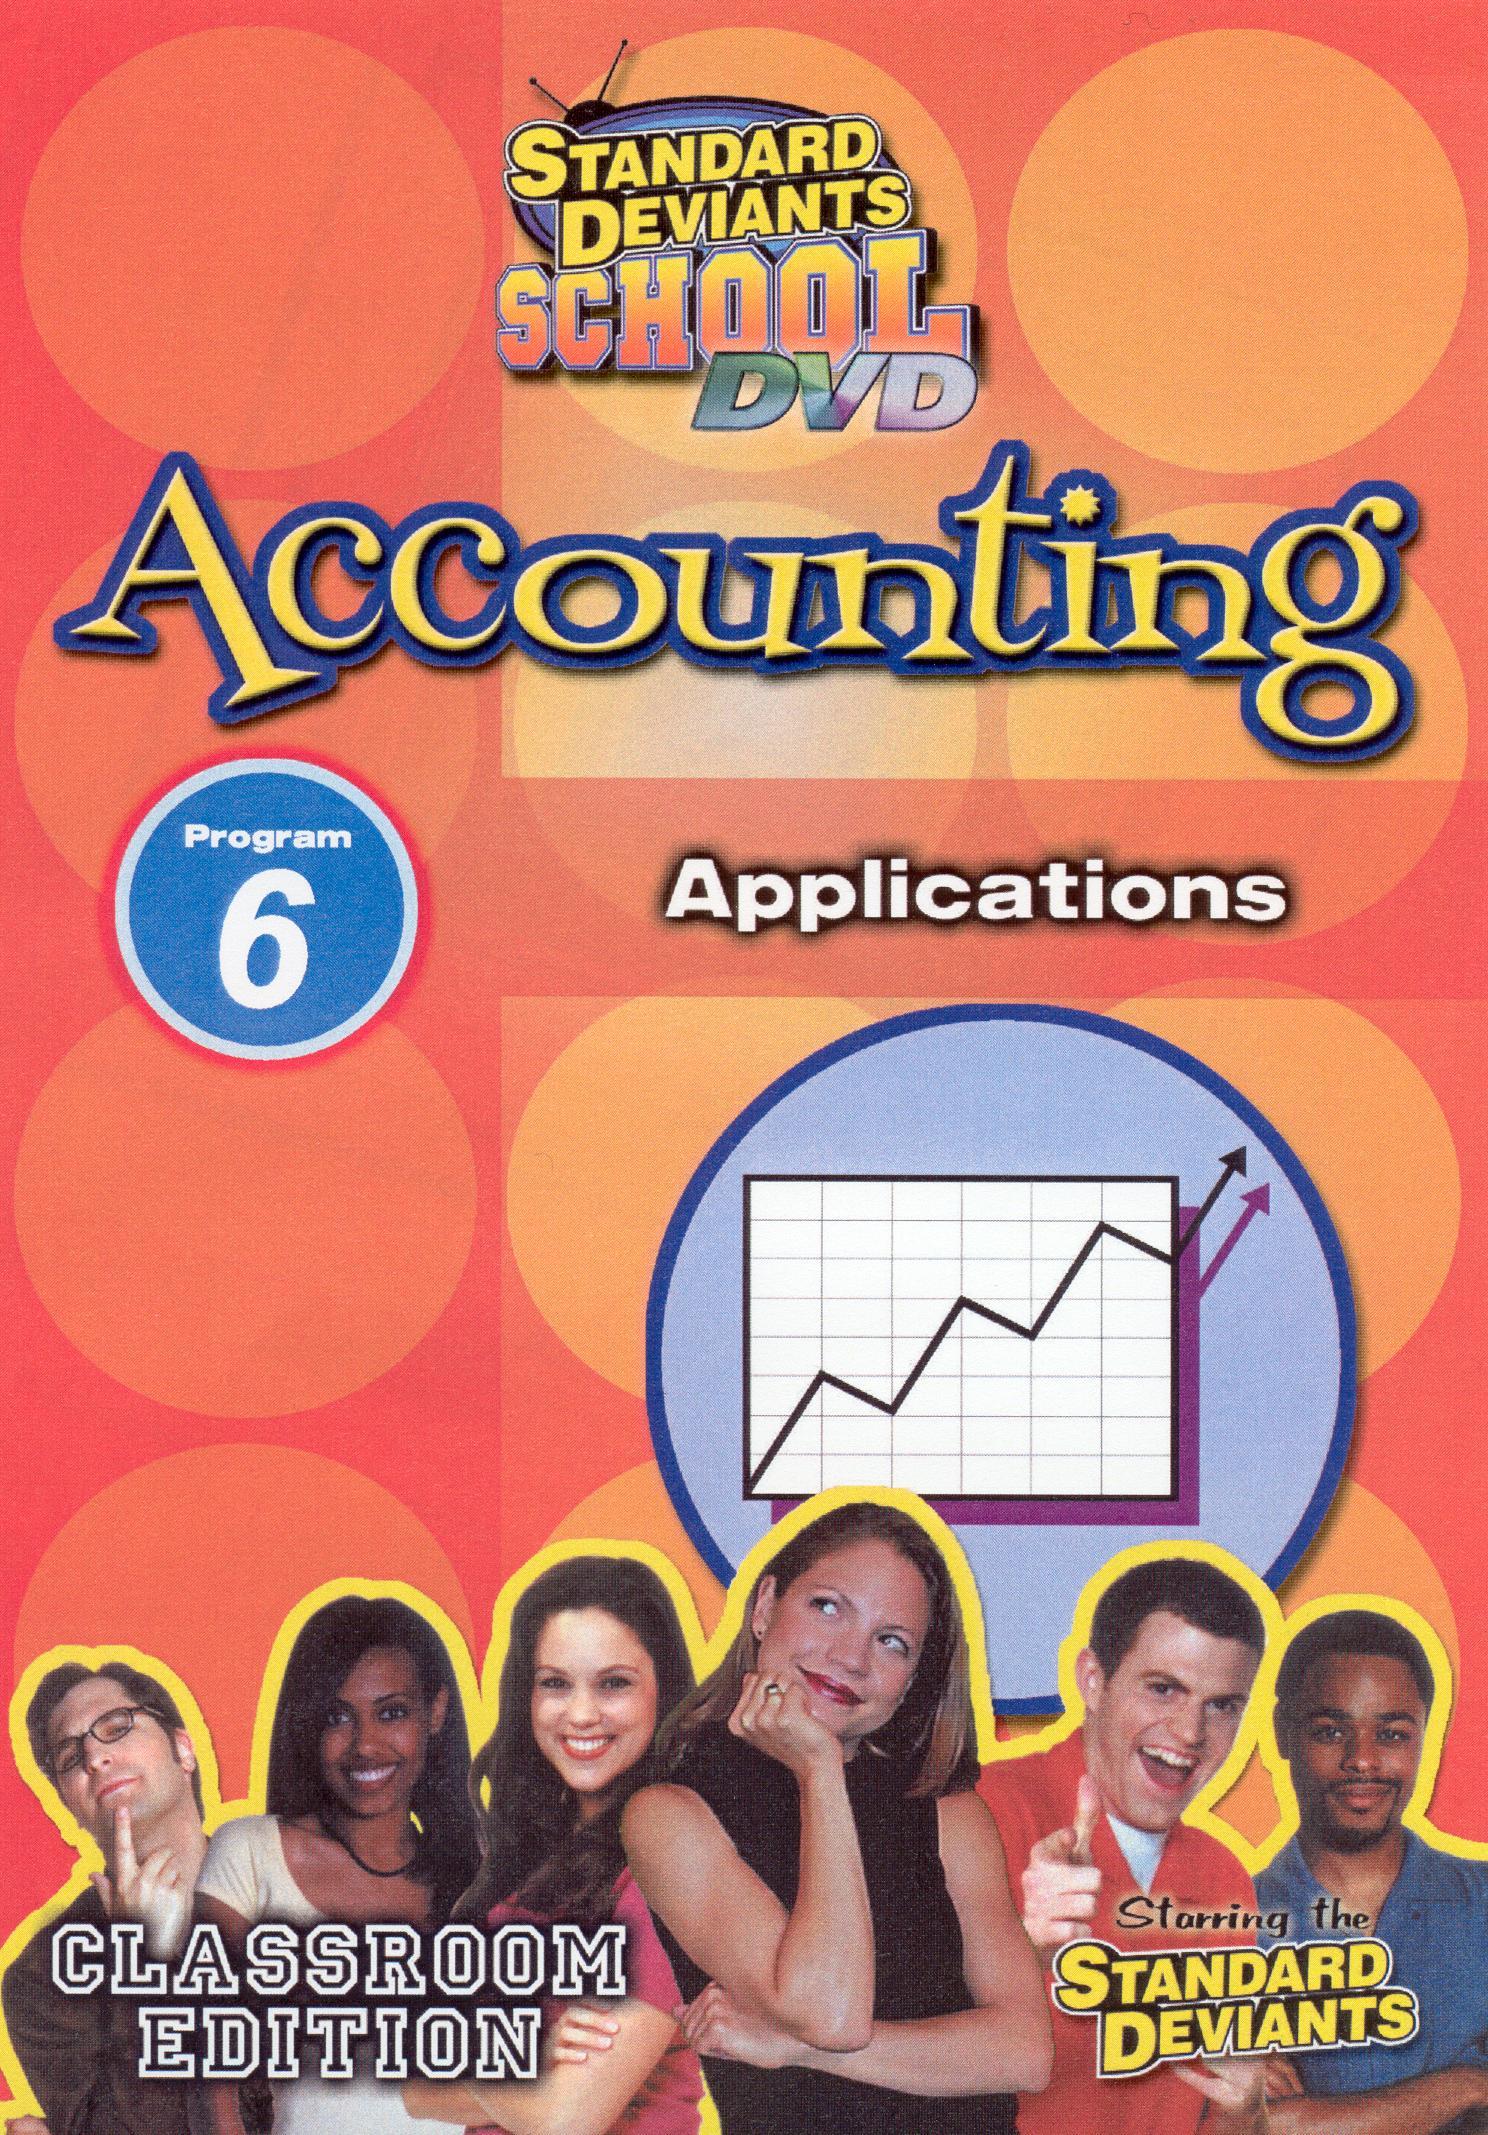 Standard Deviants School: Accounting, Program 6